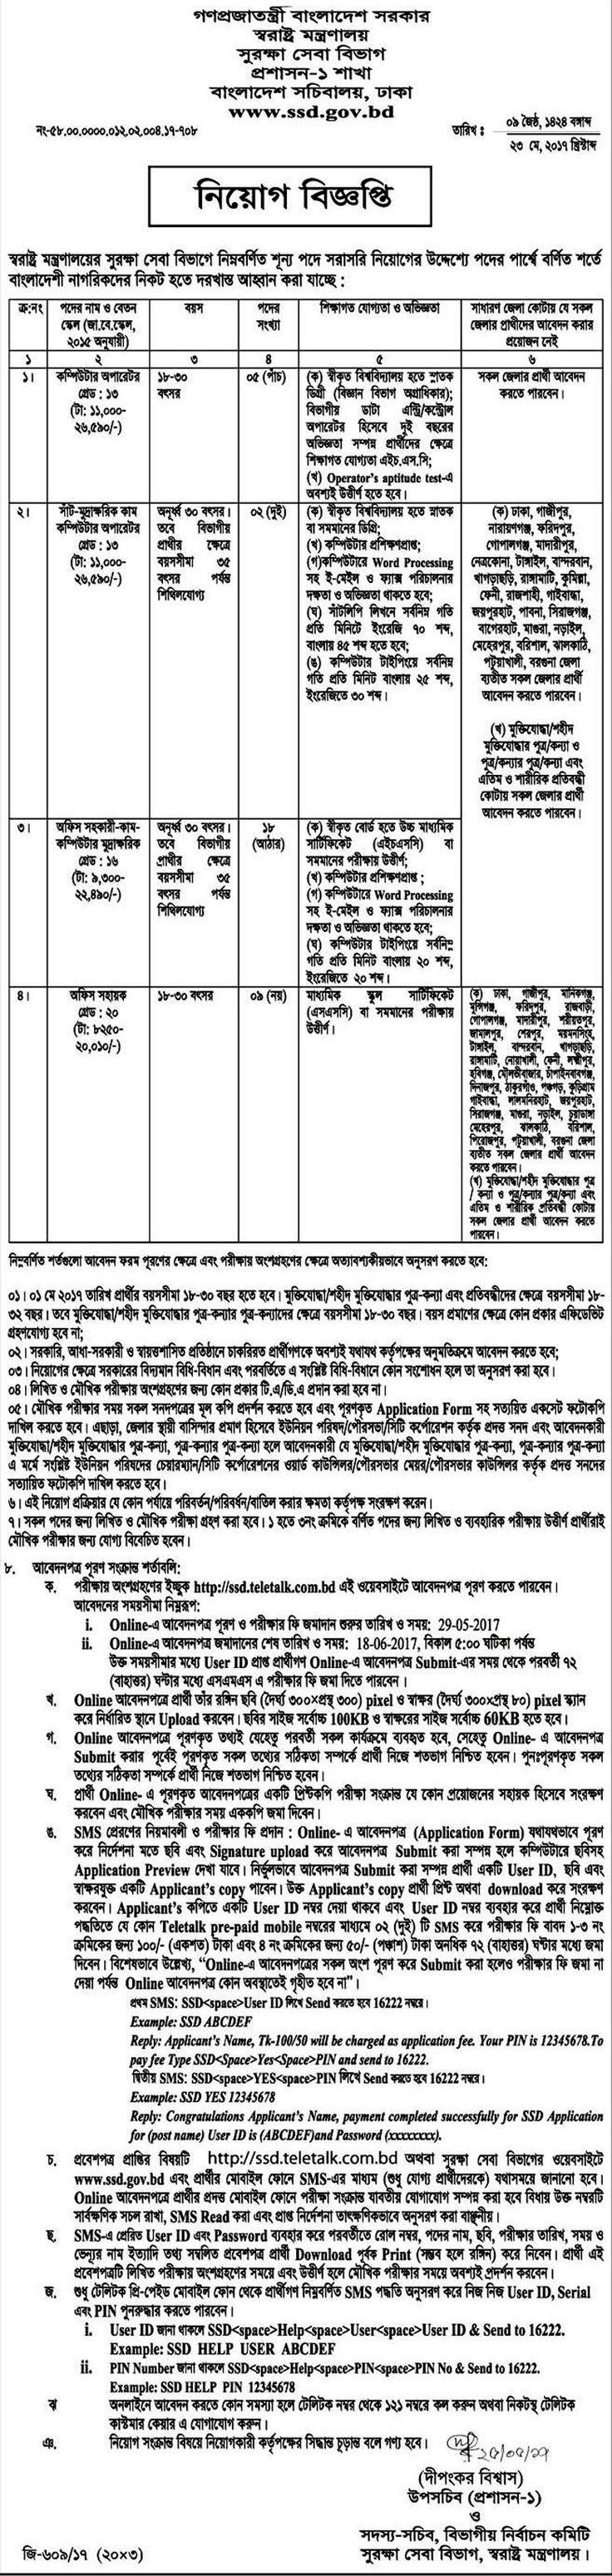 Home Affairs Ministry Job Circular 2017